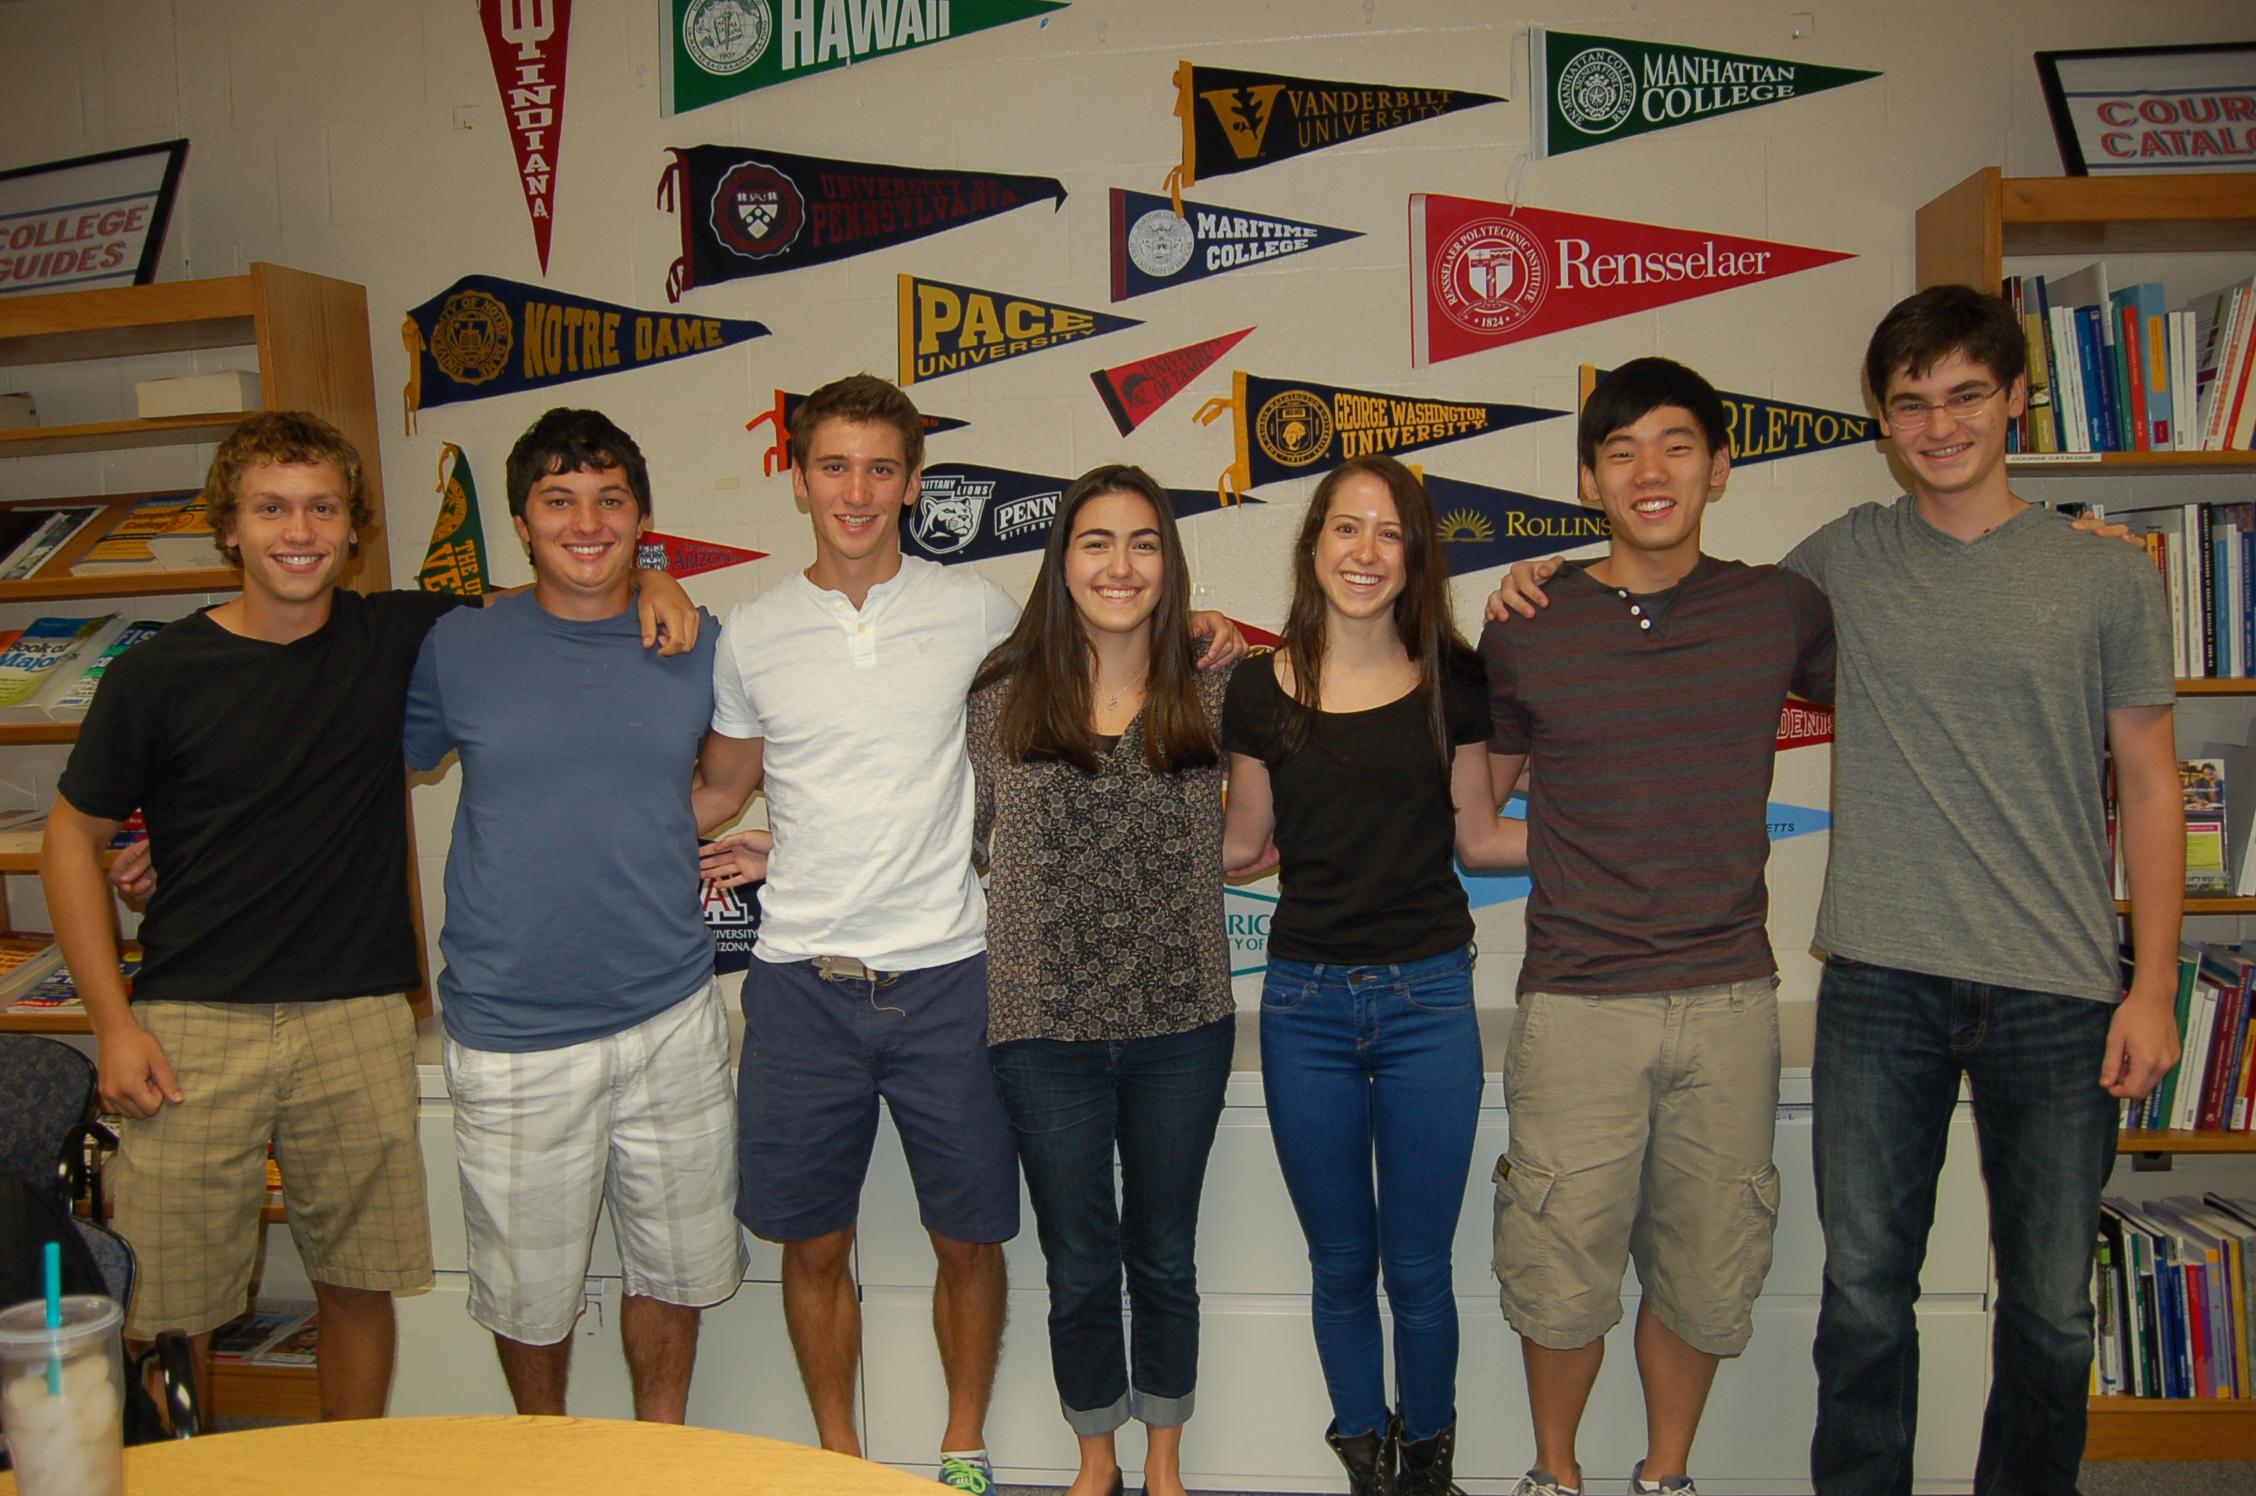 Byram Hills High School National Merit Finalists, from left: Connor O'Day, Lance Mack, Jonathan Bricker, Jennifer Gold, Brooke Robbins, Andrew Kim, and Jonathan Bohrer.